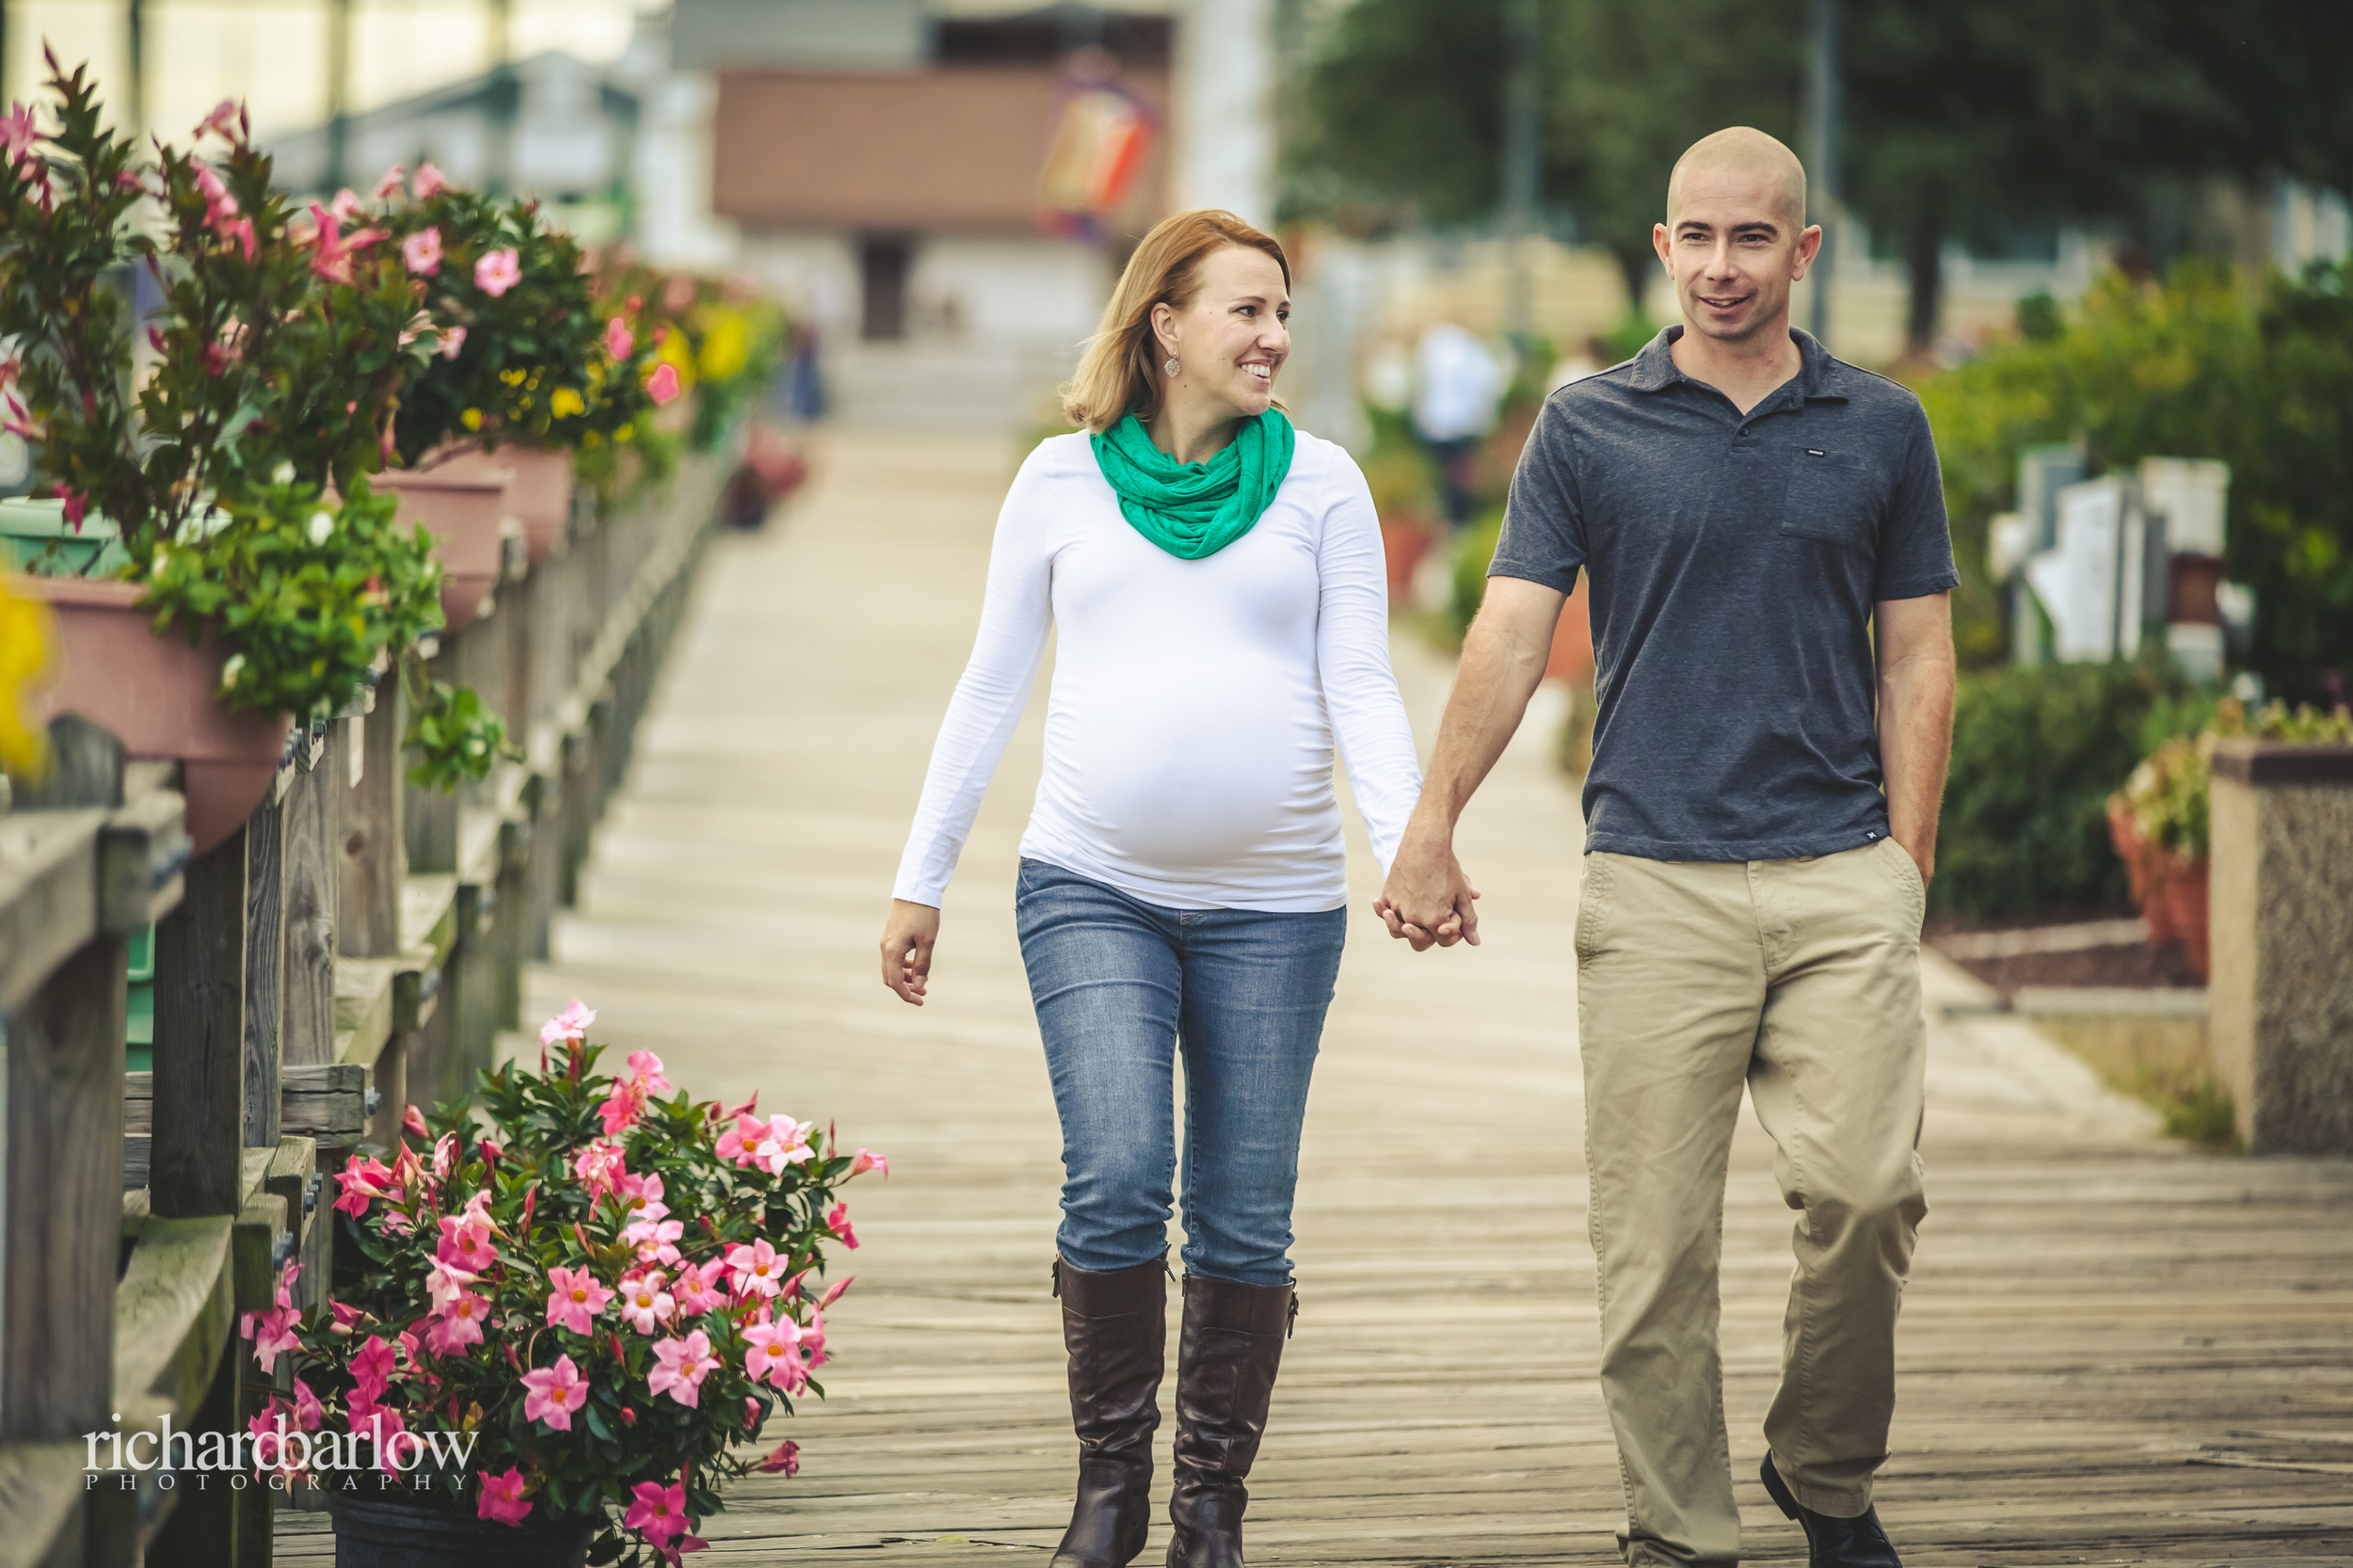 richard barlow photography - Sarah Maternity Session - Beaufort waterfront-18.jpg